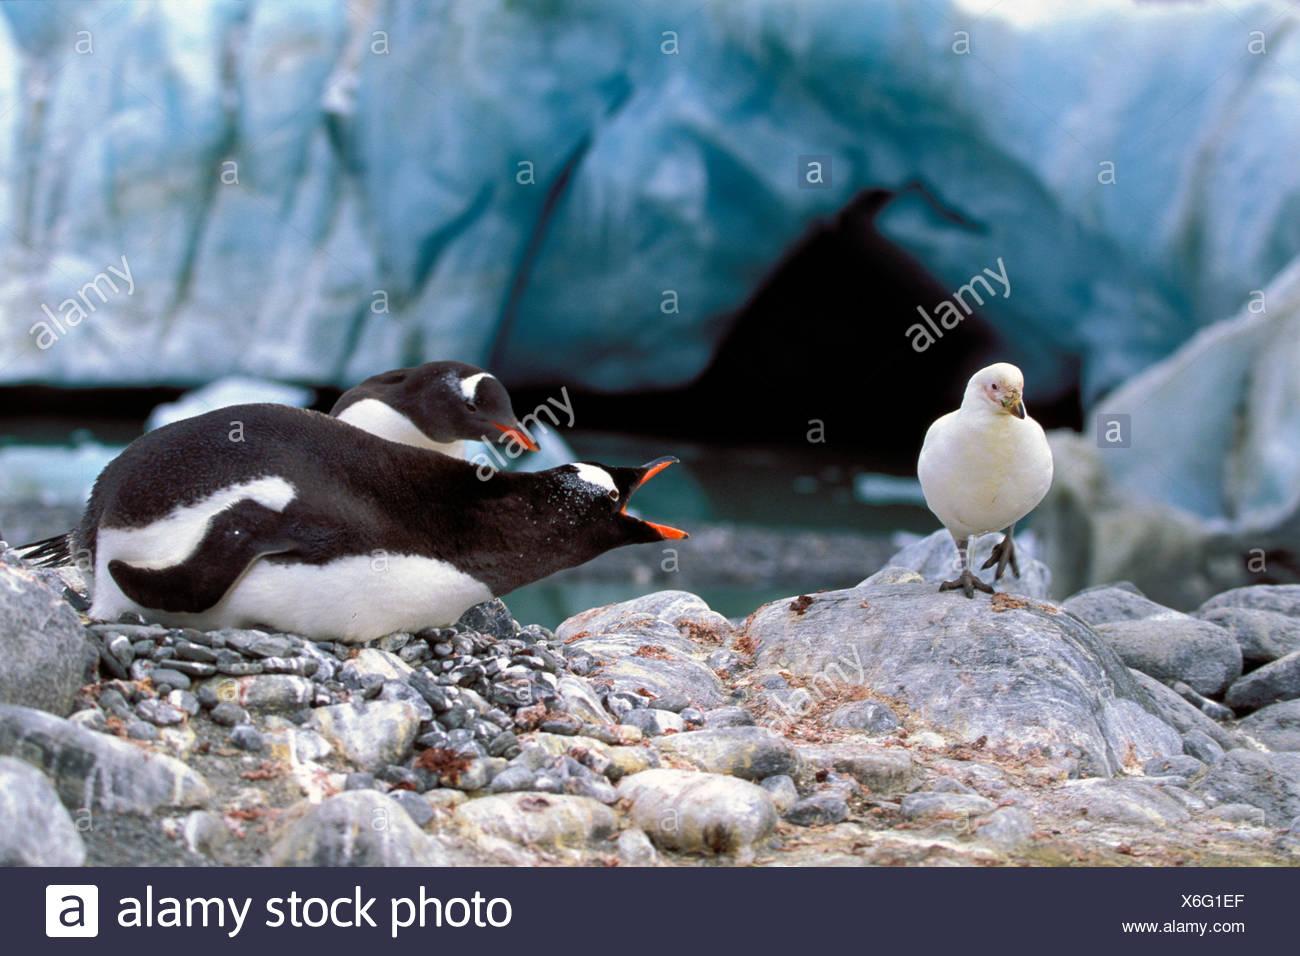 gentoo penguin (Pygoscelis papua), defencing sheathbill, Chionis alba, Antarctica - Stock Image